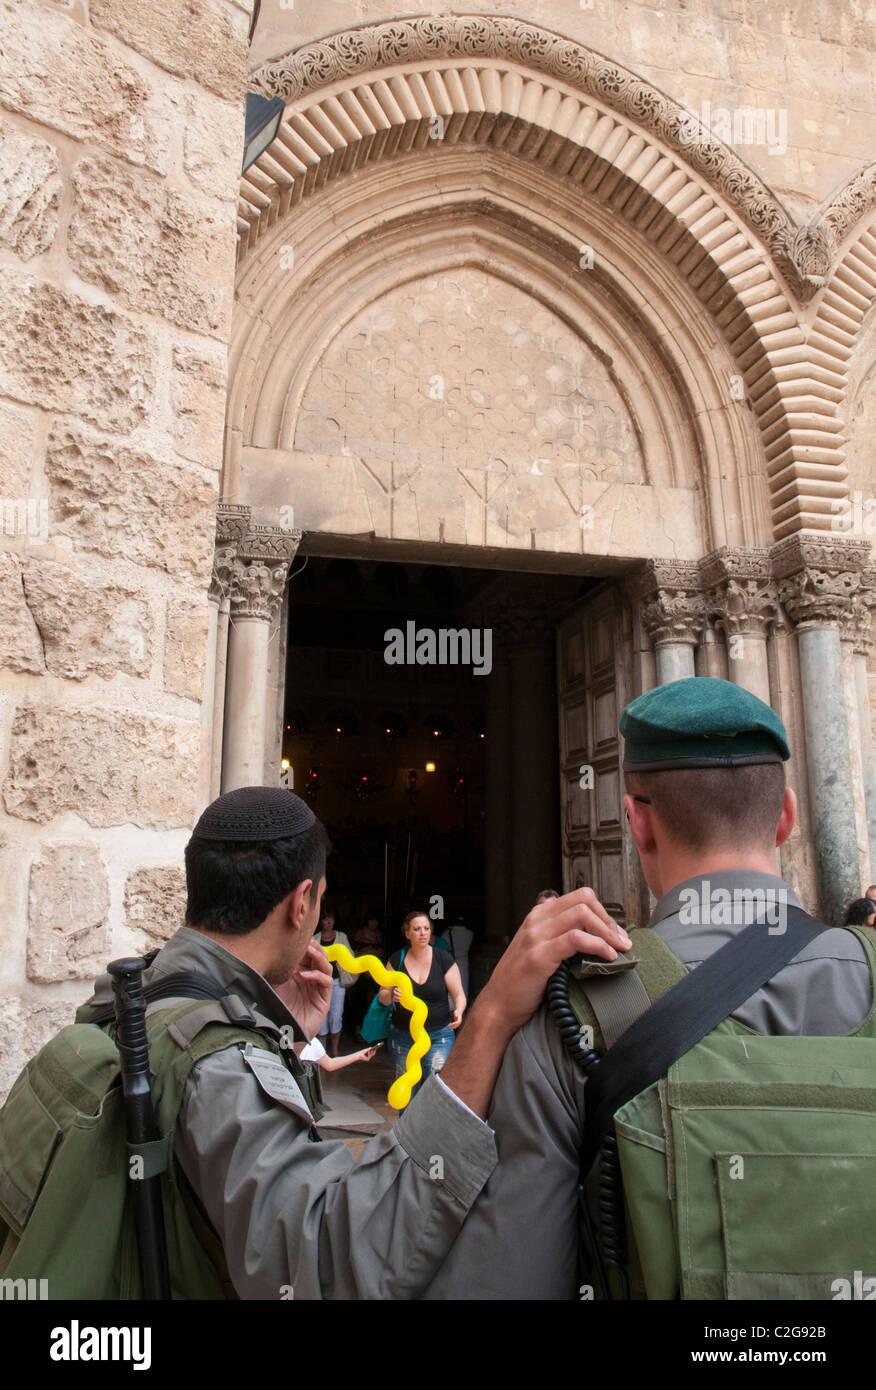 2 Israeli border patrol standing at the gate to Holy Sepulcher. Jerusalem Old City. Israel - Stock Image